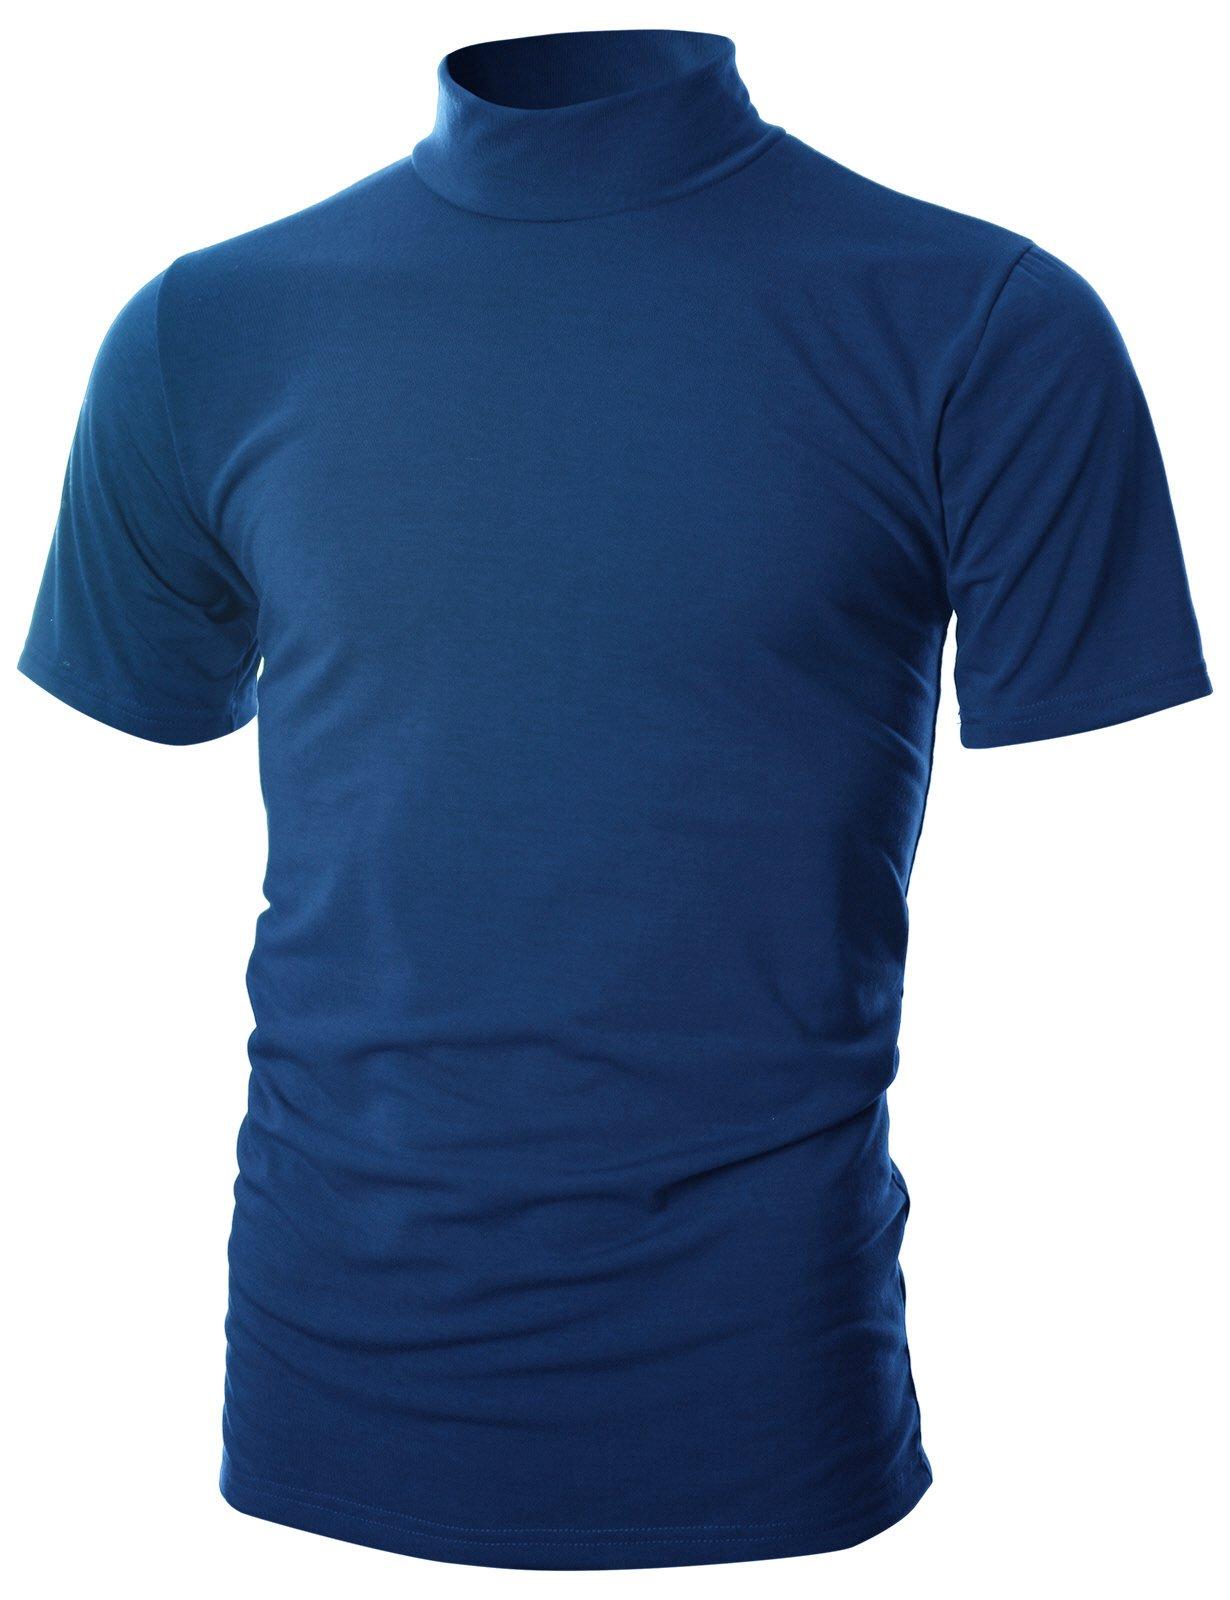 Ohoo Mens Slim Fit Soft Cotton Short Sleeve Pullover Lightweight Turtleneck Warm Inside /DCT101-BLUE-S